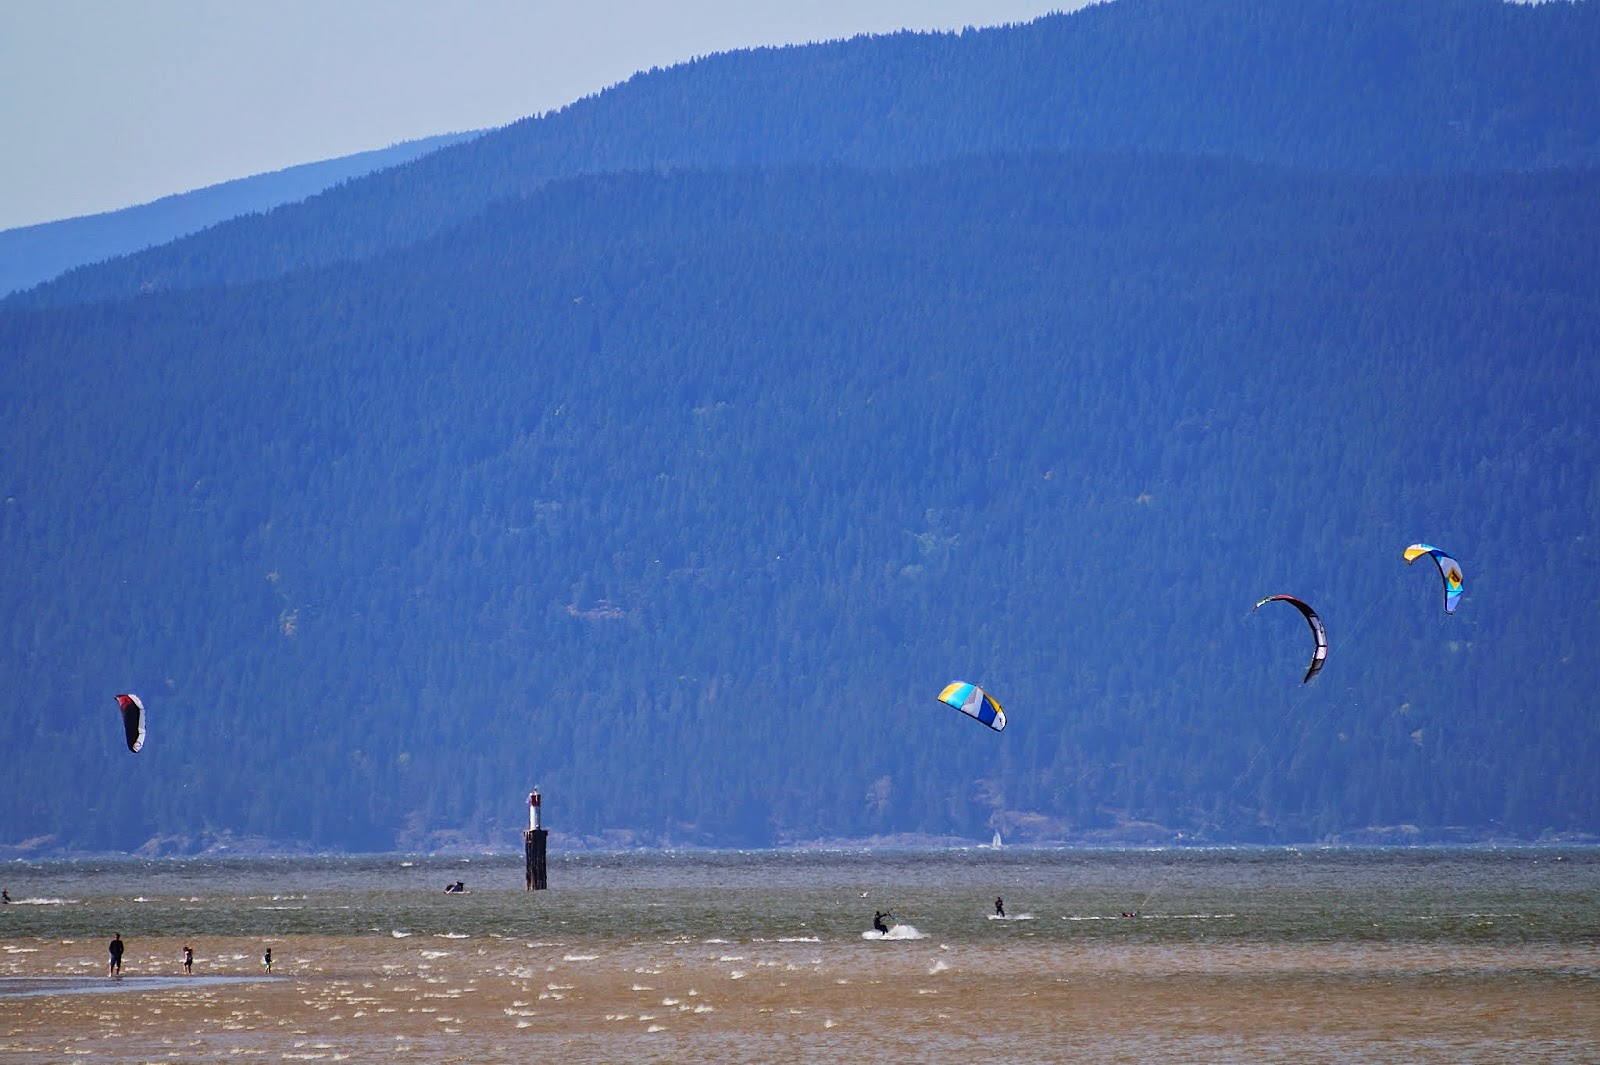 Кайтсерфинг на пляже Джерико